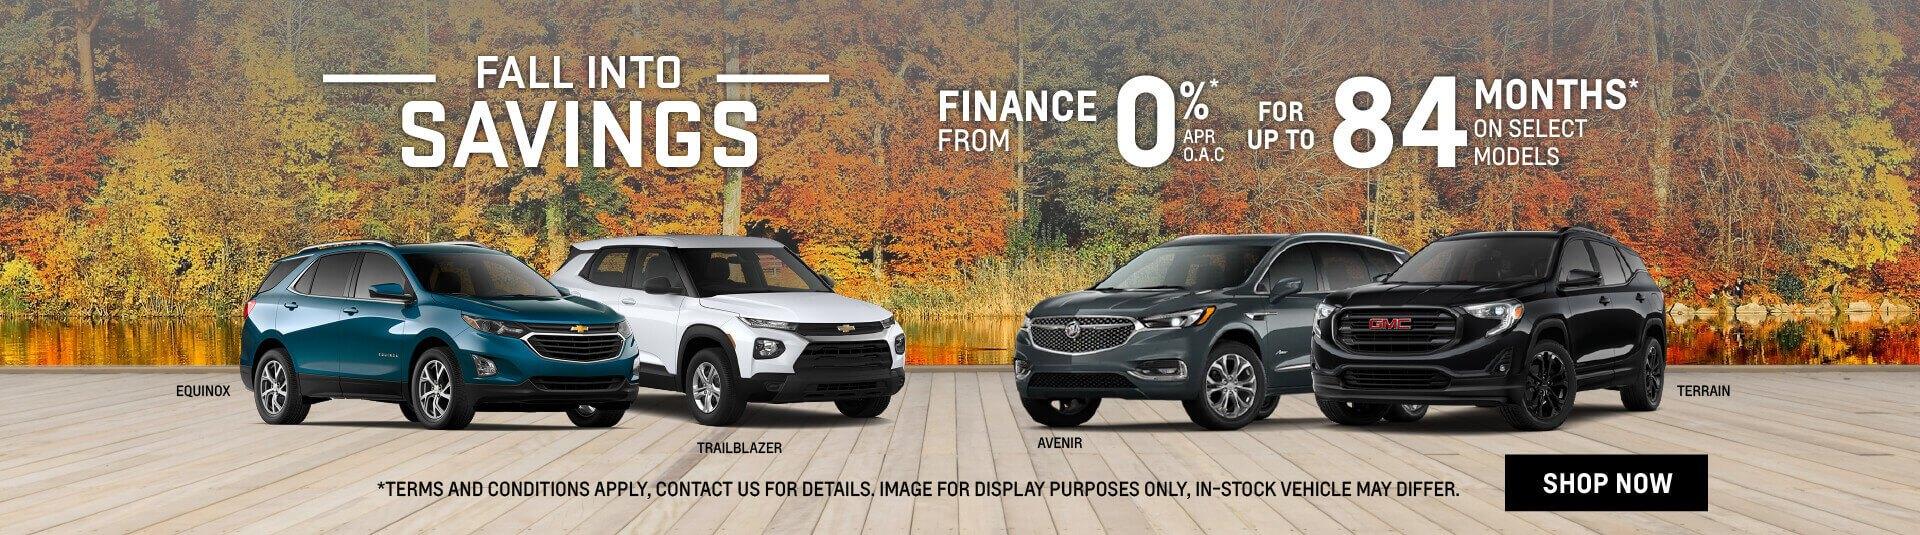 GM Fall Into Savings Event in Toronto - City GM